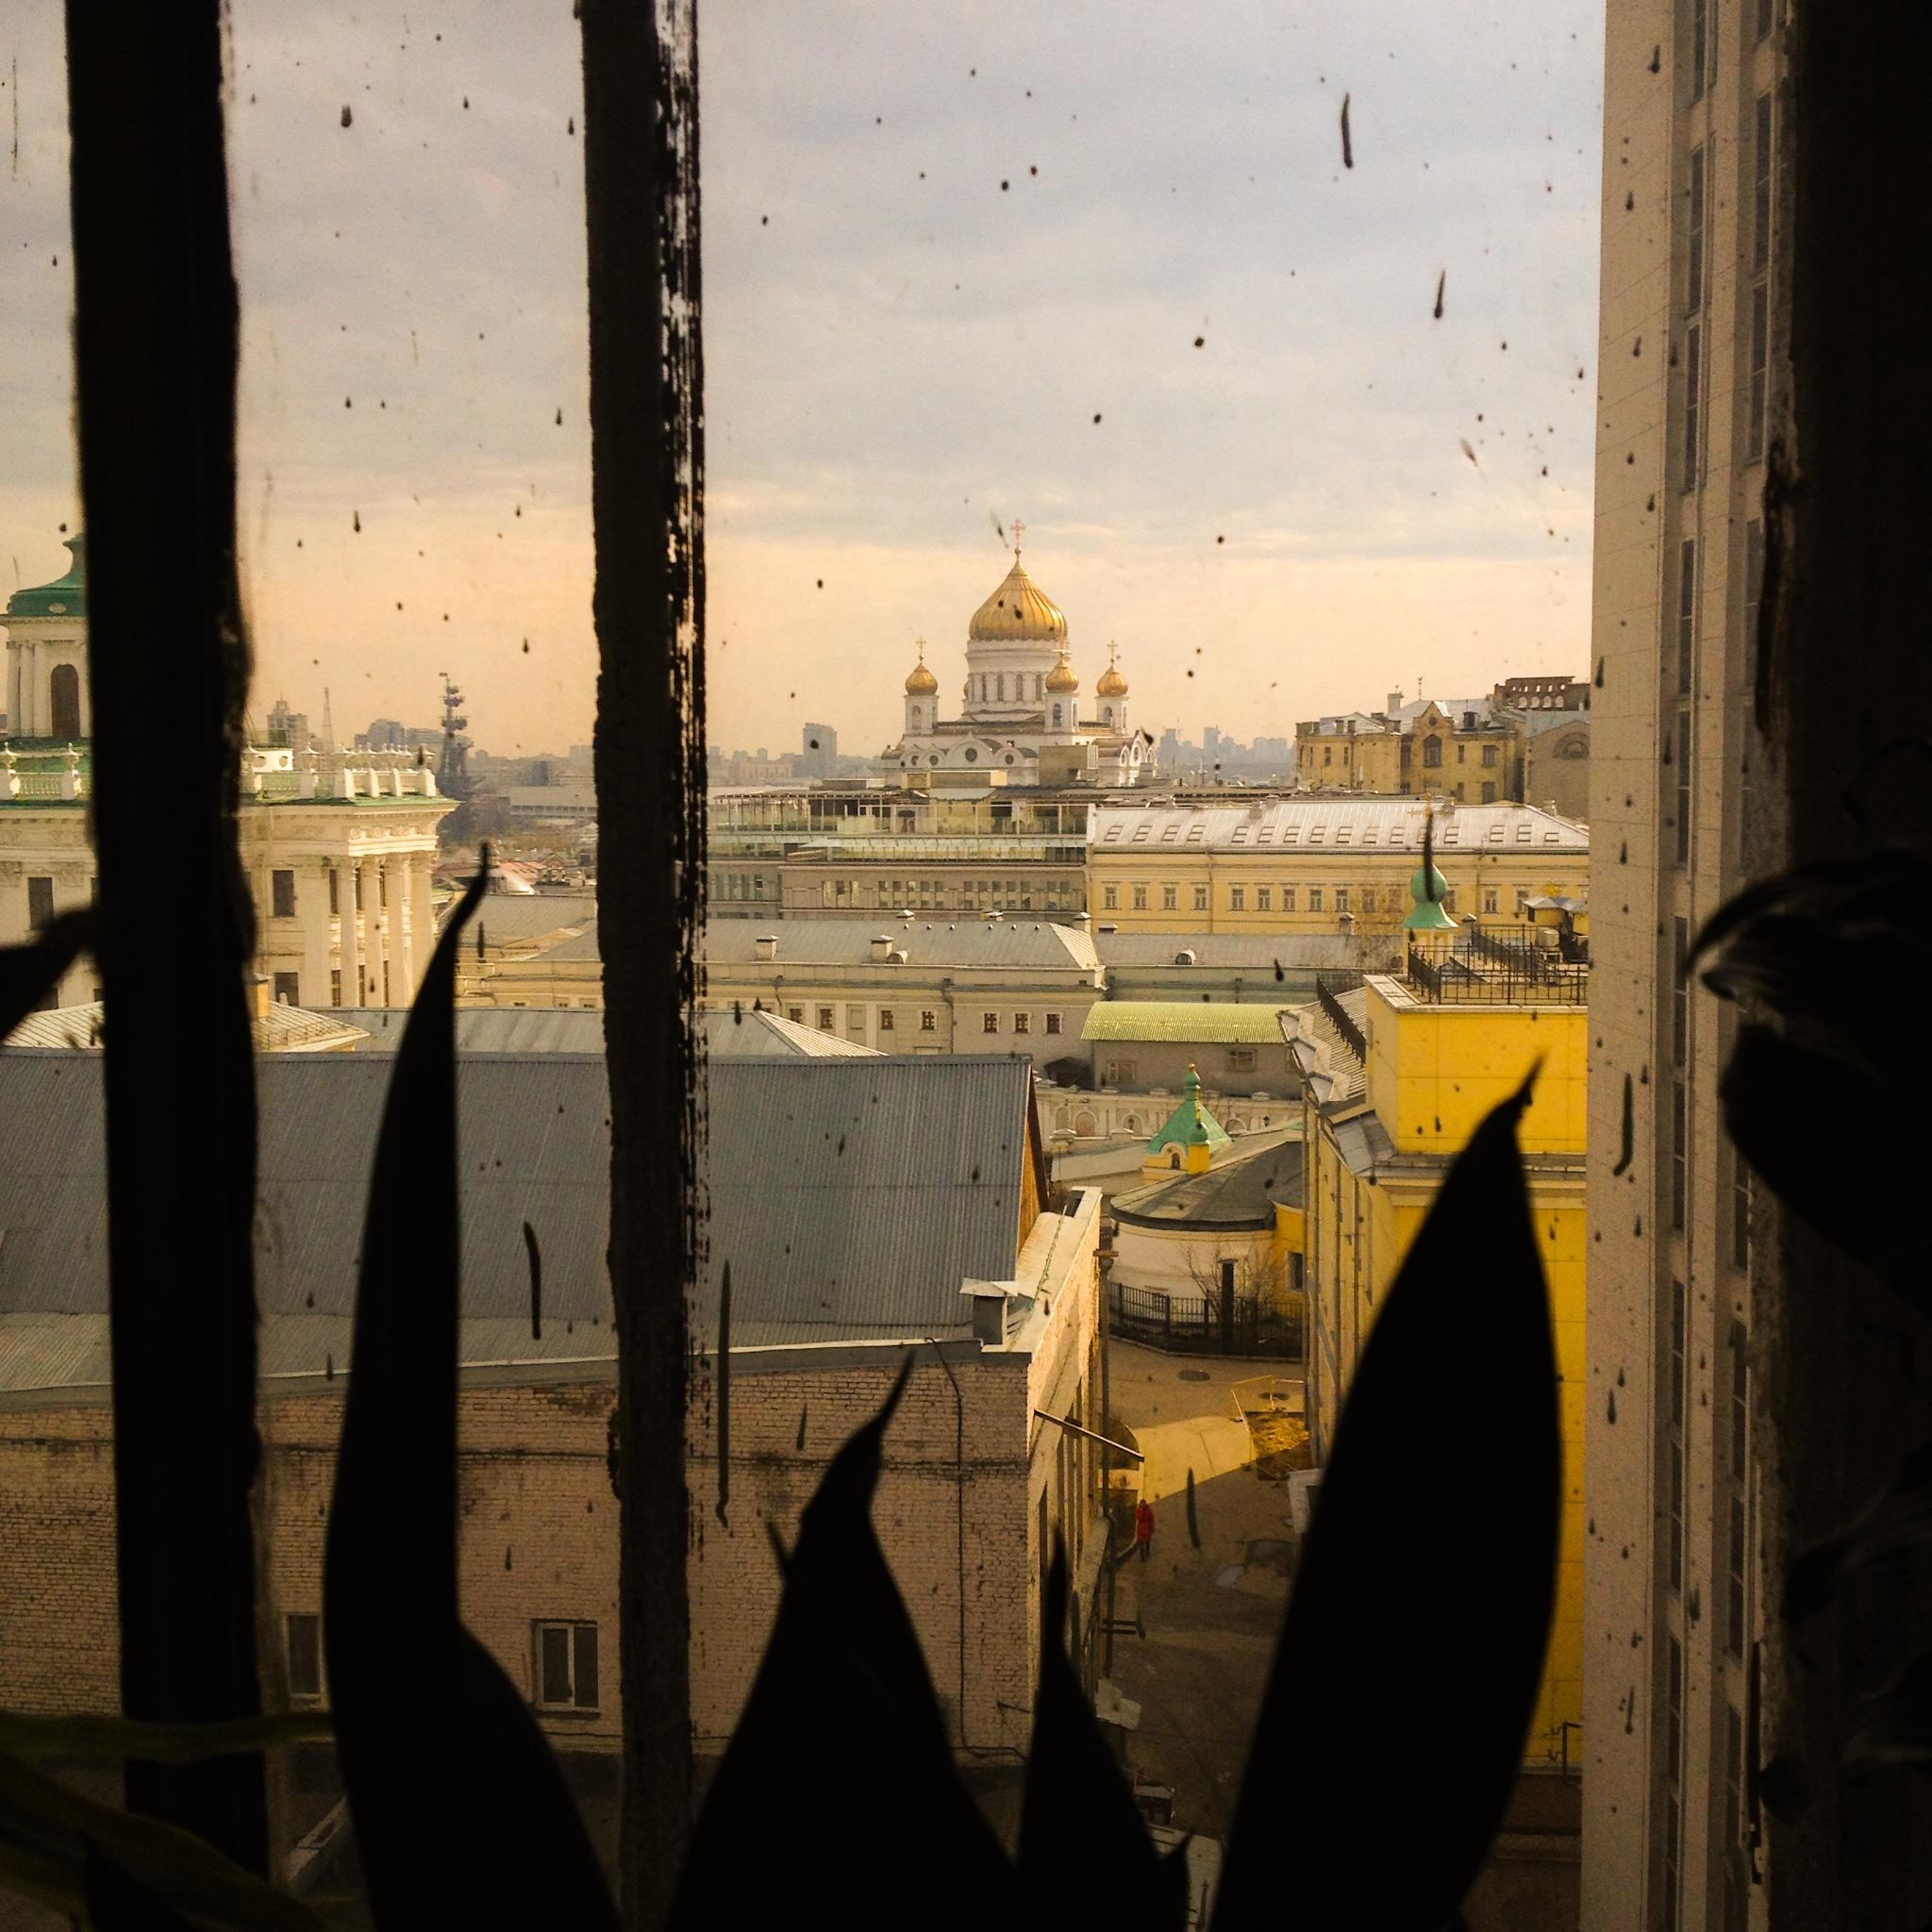 Vor dem Fenster die Christ-Erlöser-Kathedrale